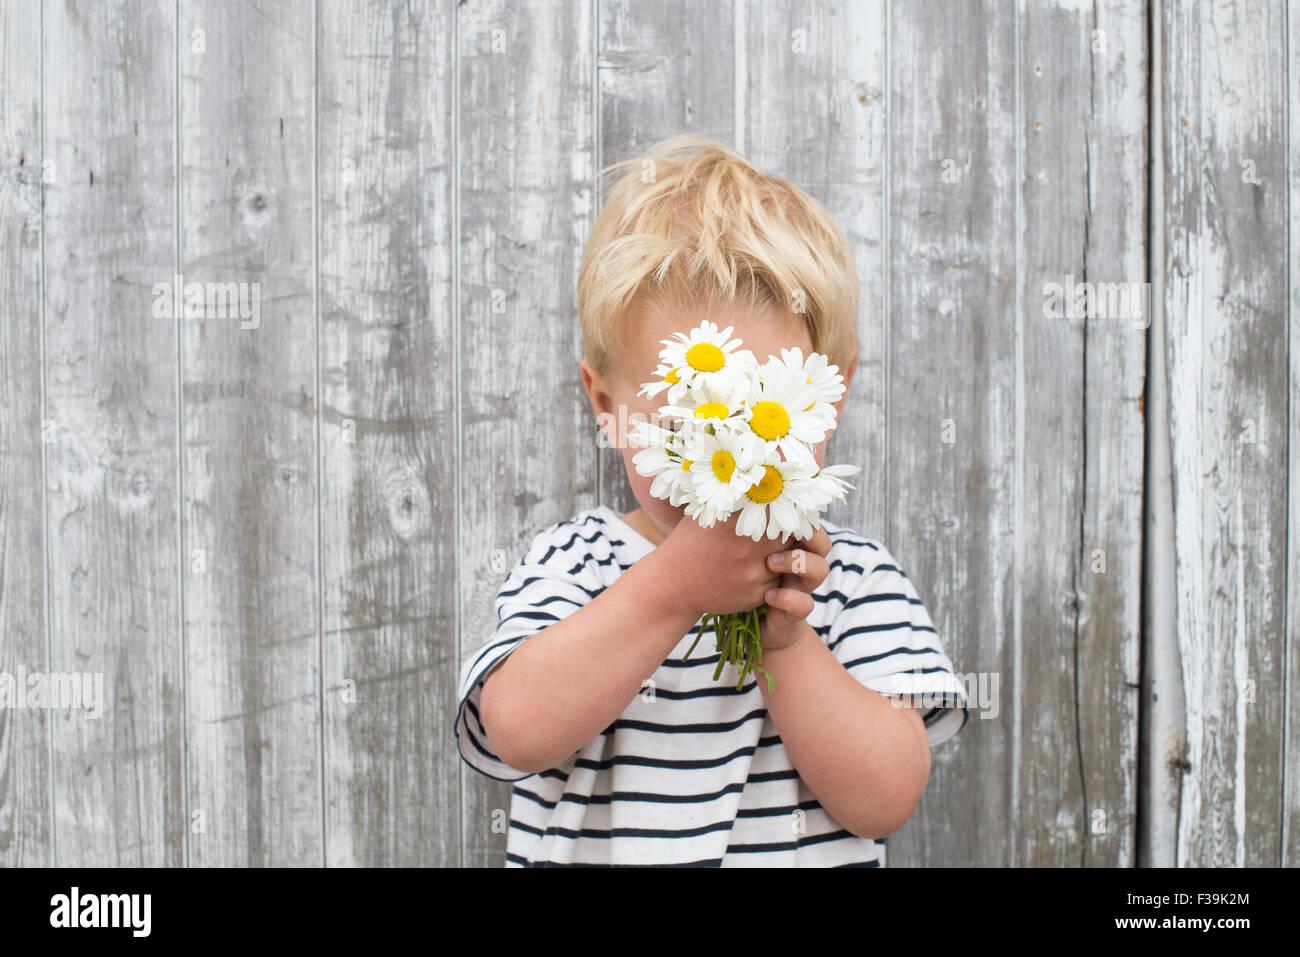 Junge versteckt sich hinter Gänseblümchen Stockbild